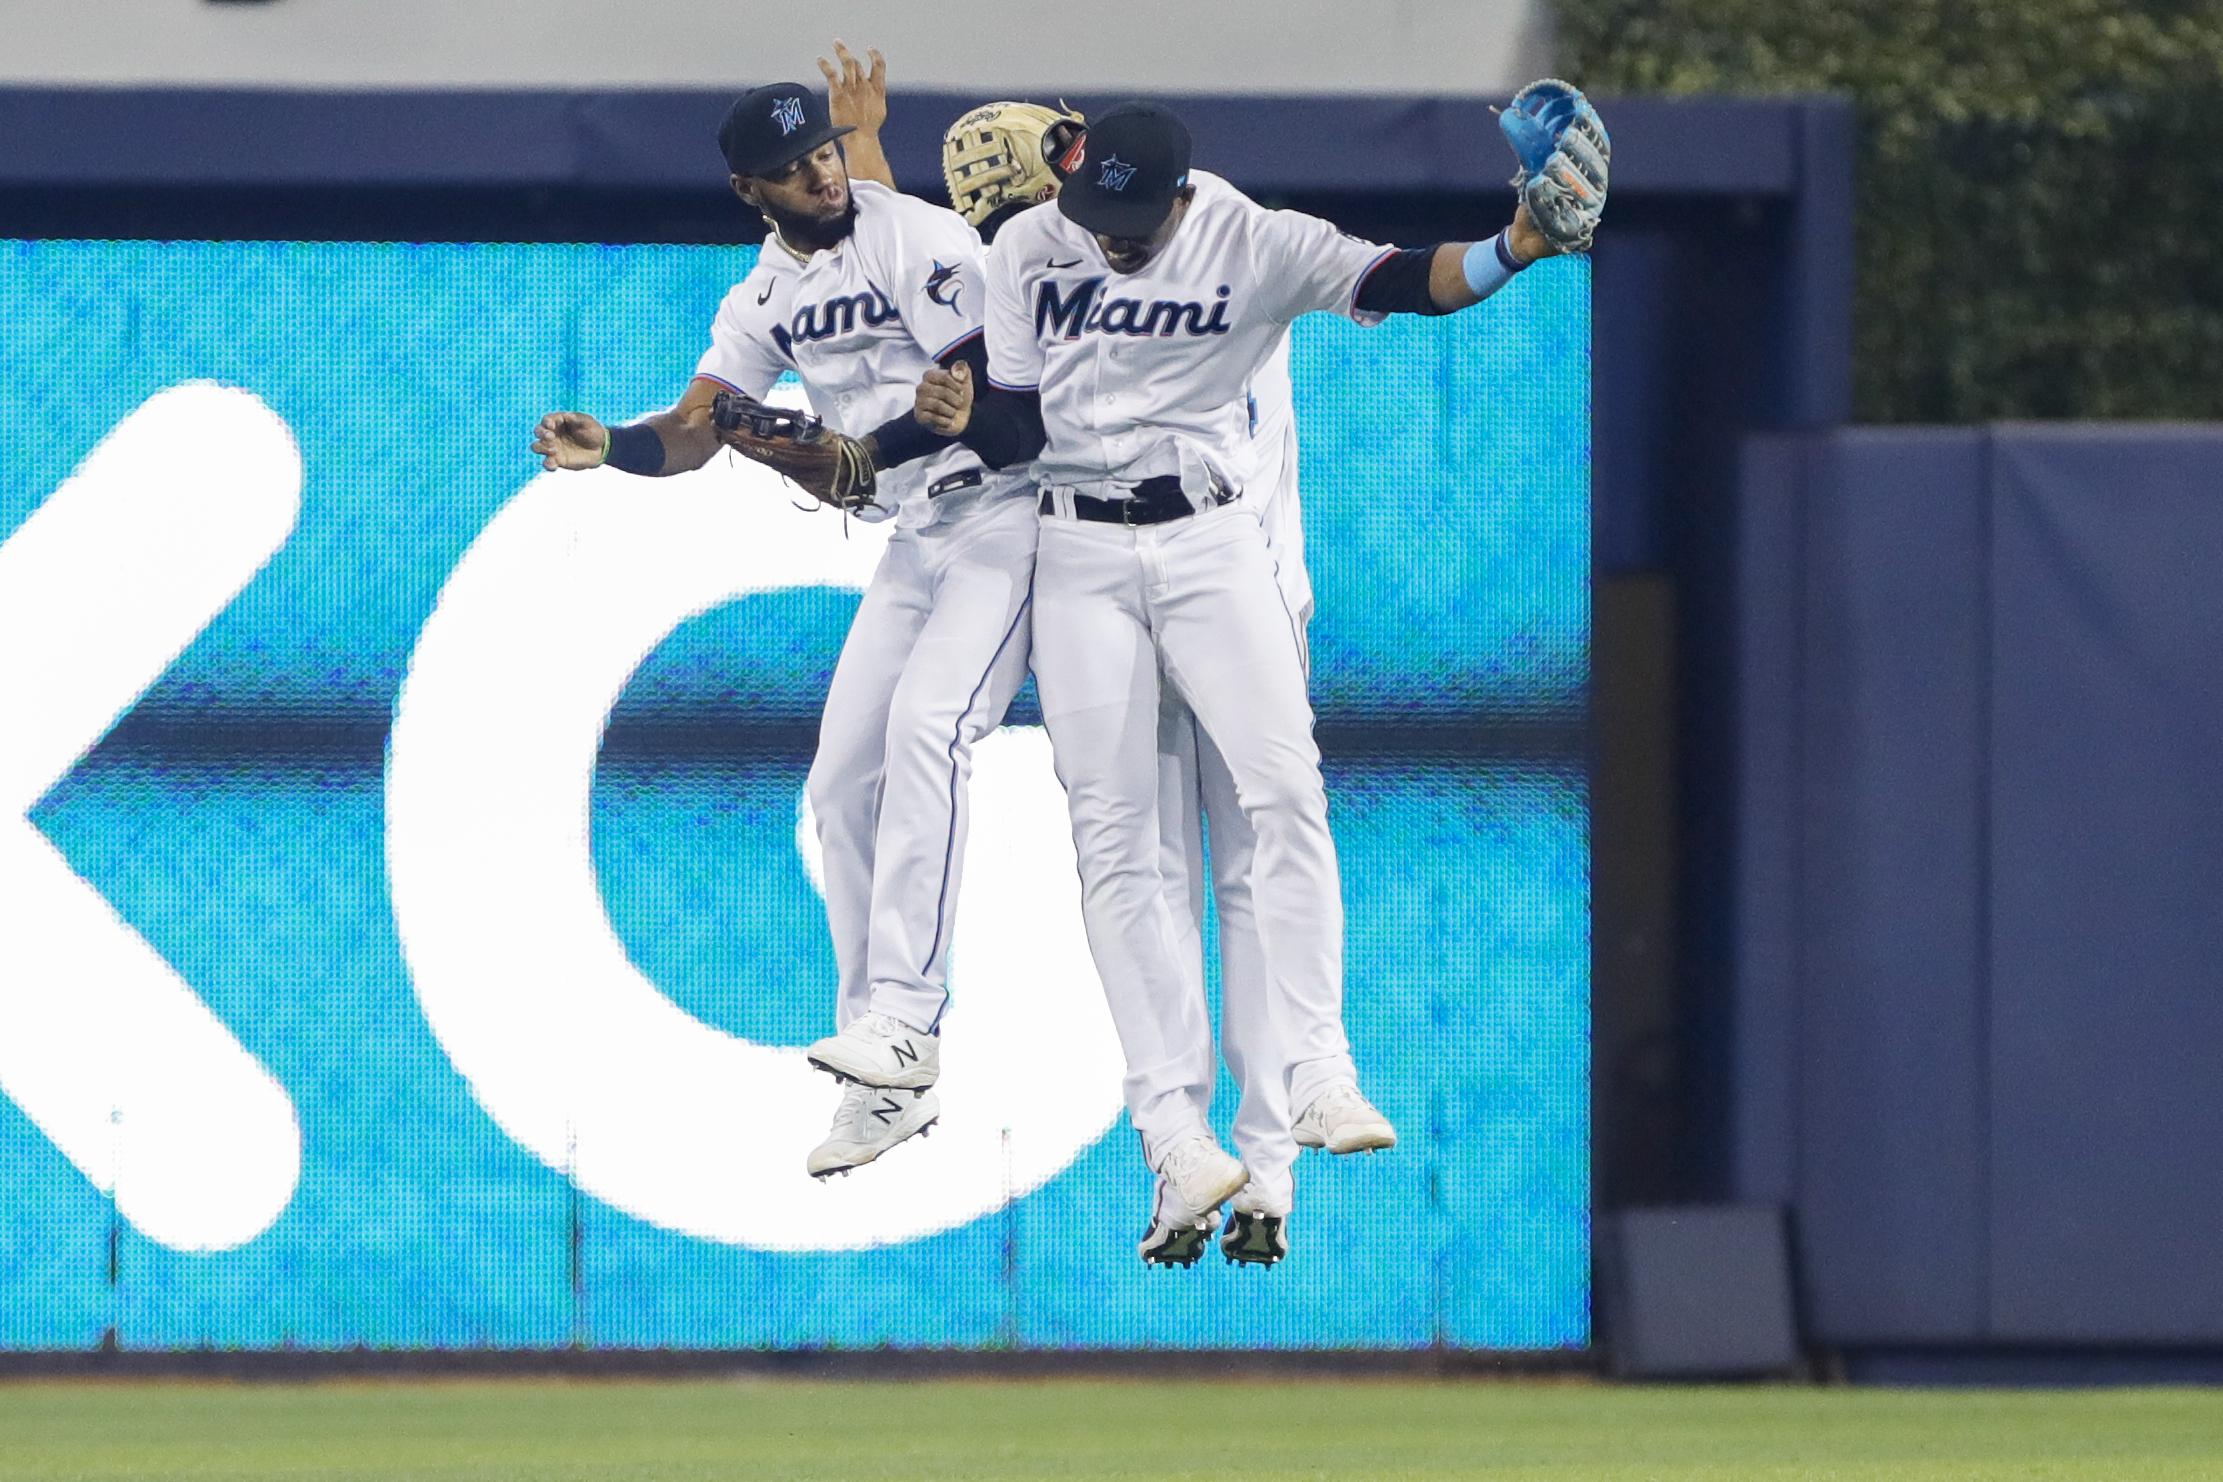 Miami Marlins right fielder Bryan De La Cruz (77) and right fielder Jesus Sanchez (76) celebrate after winning the game against the Cincinnati Reds at loanDepot Park